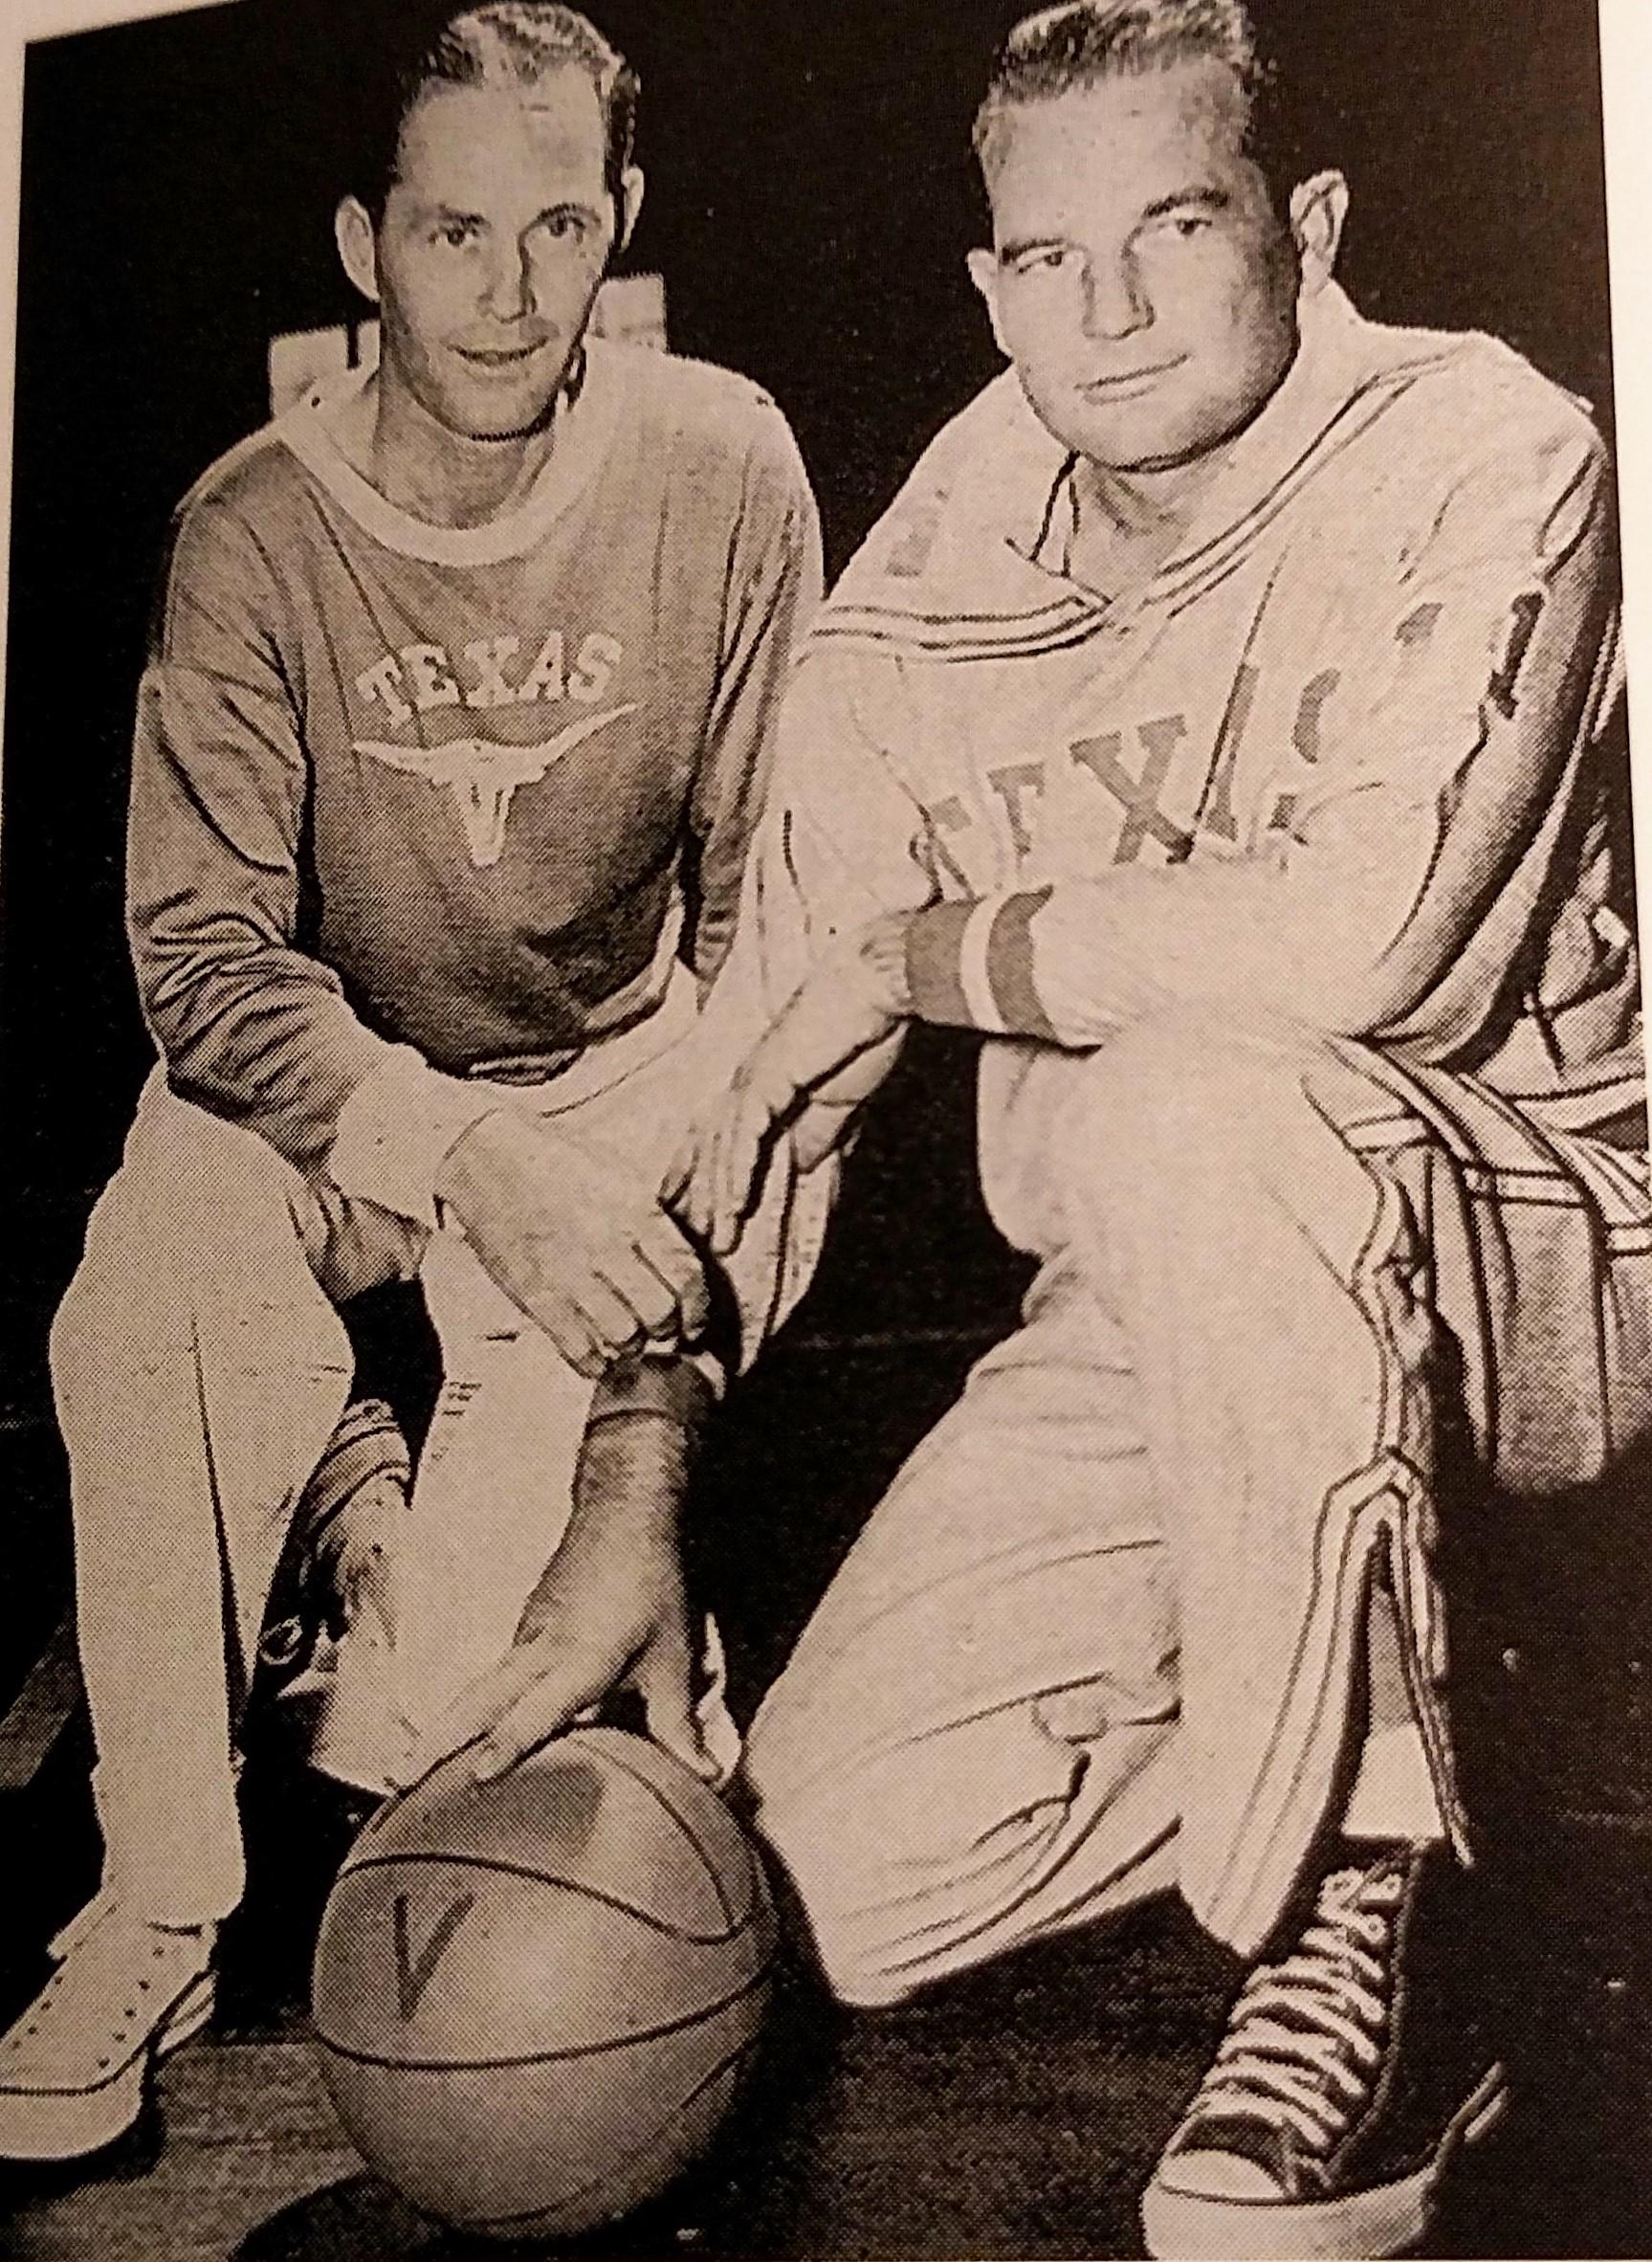 Coach Hughes and Coach Hull  (right)